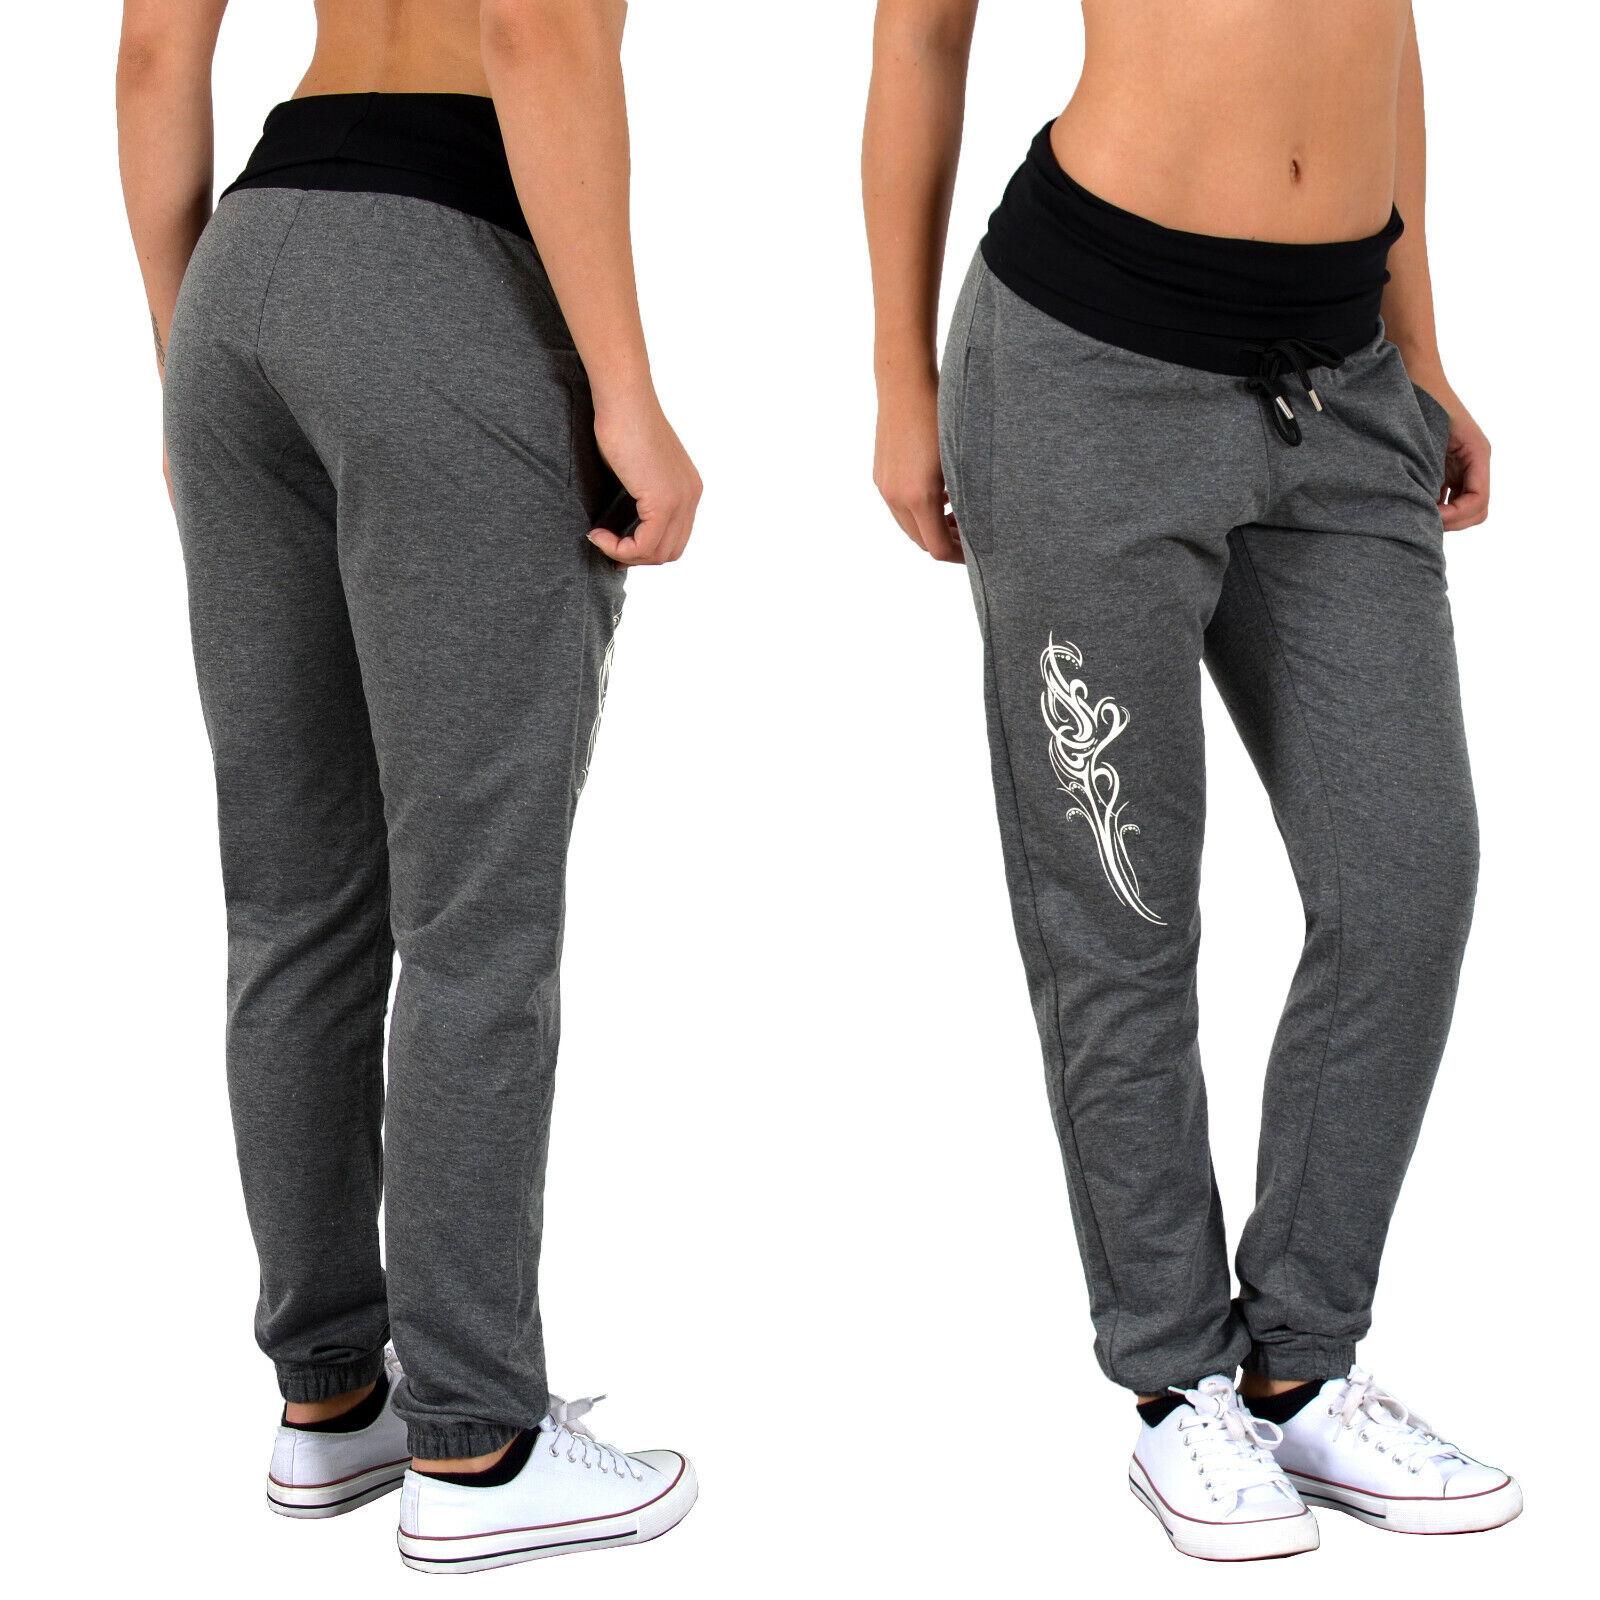 Damen Sport Hose Fitness Jogging Sport Freizeithose für Damen J480